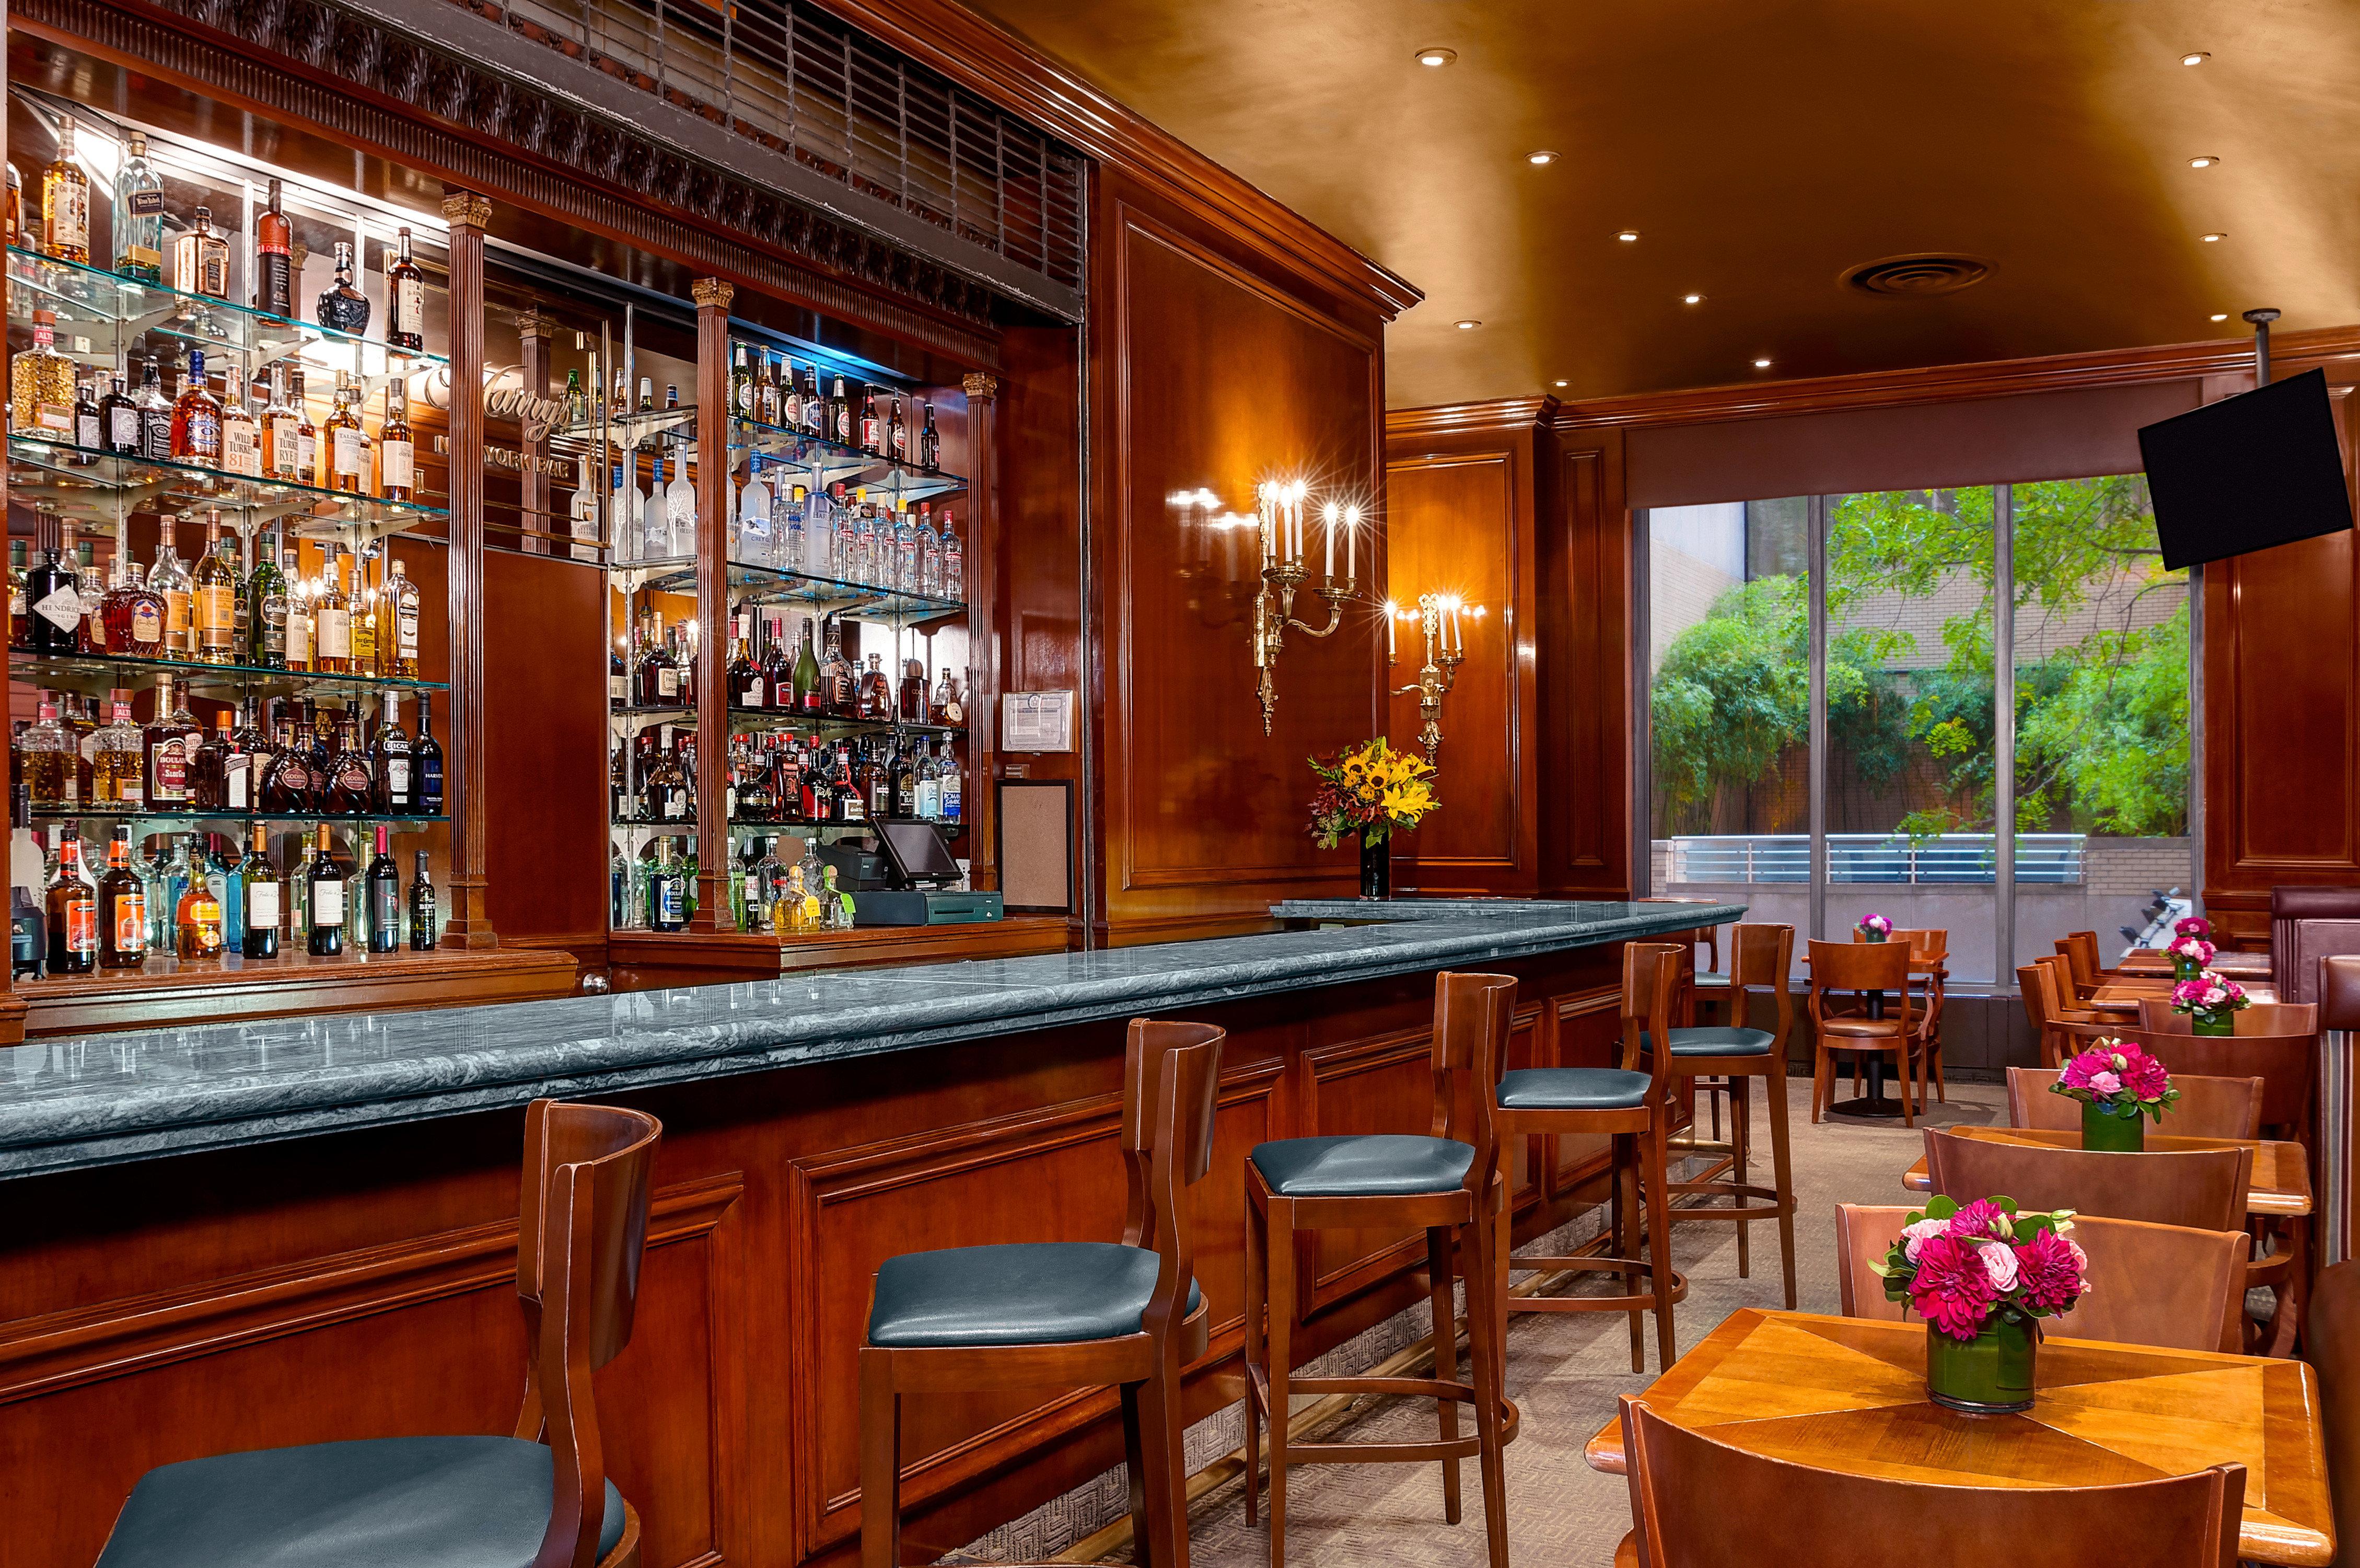 Bar City Classic Drink Eat Parks restaurant function hall Dining café